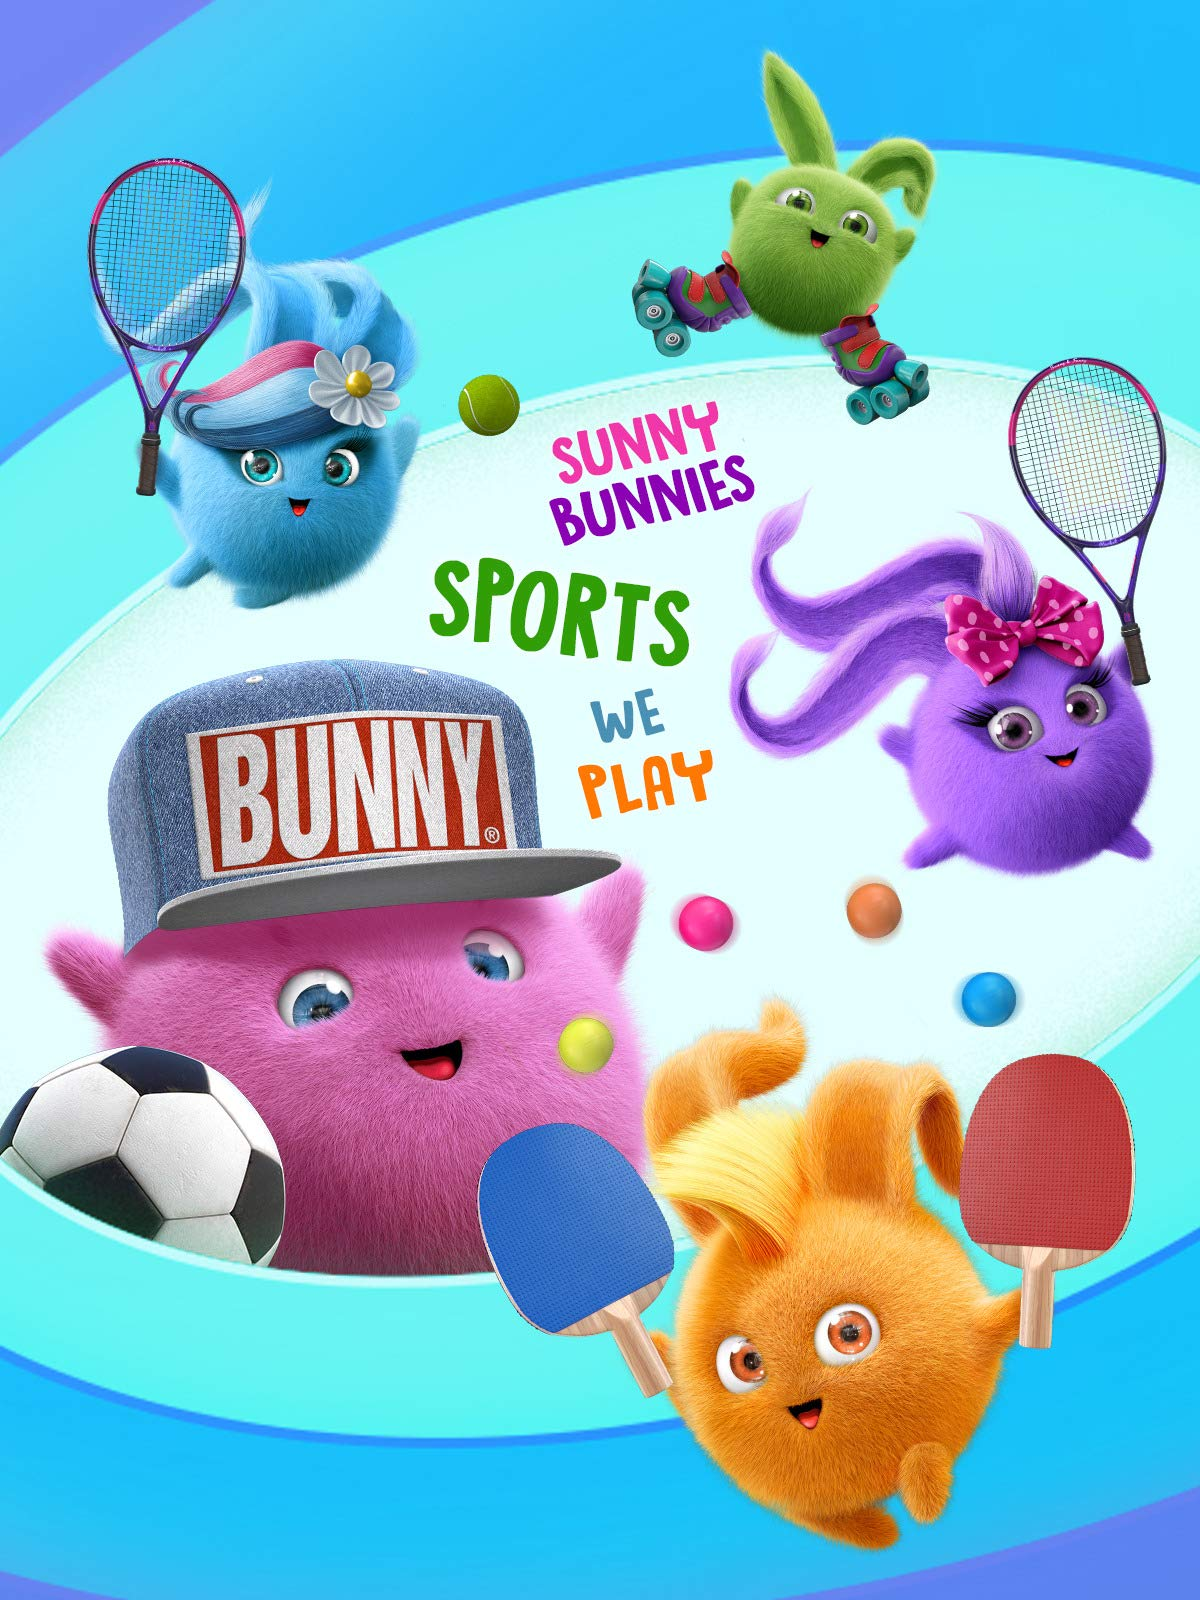 Sunny Bunnies - Sports We Play